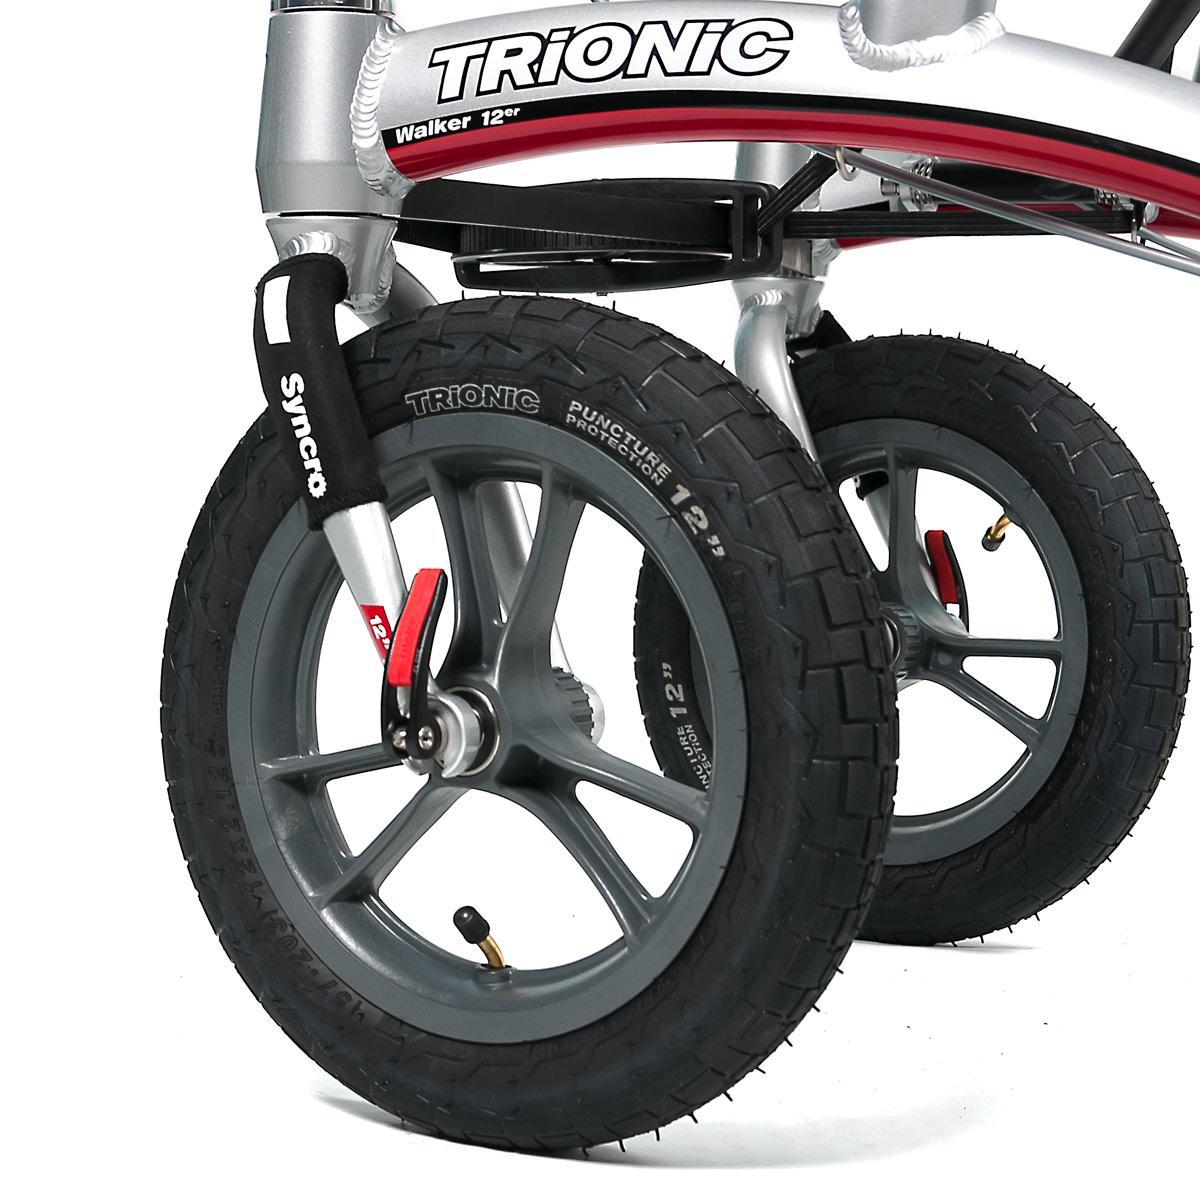 Trionic Primera タイヤ